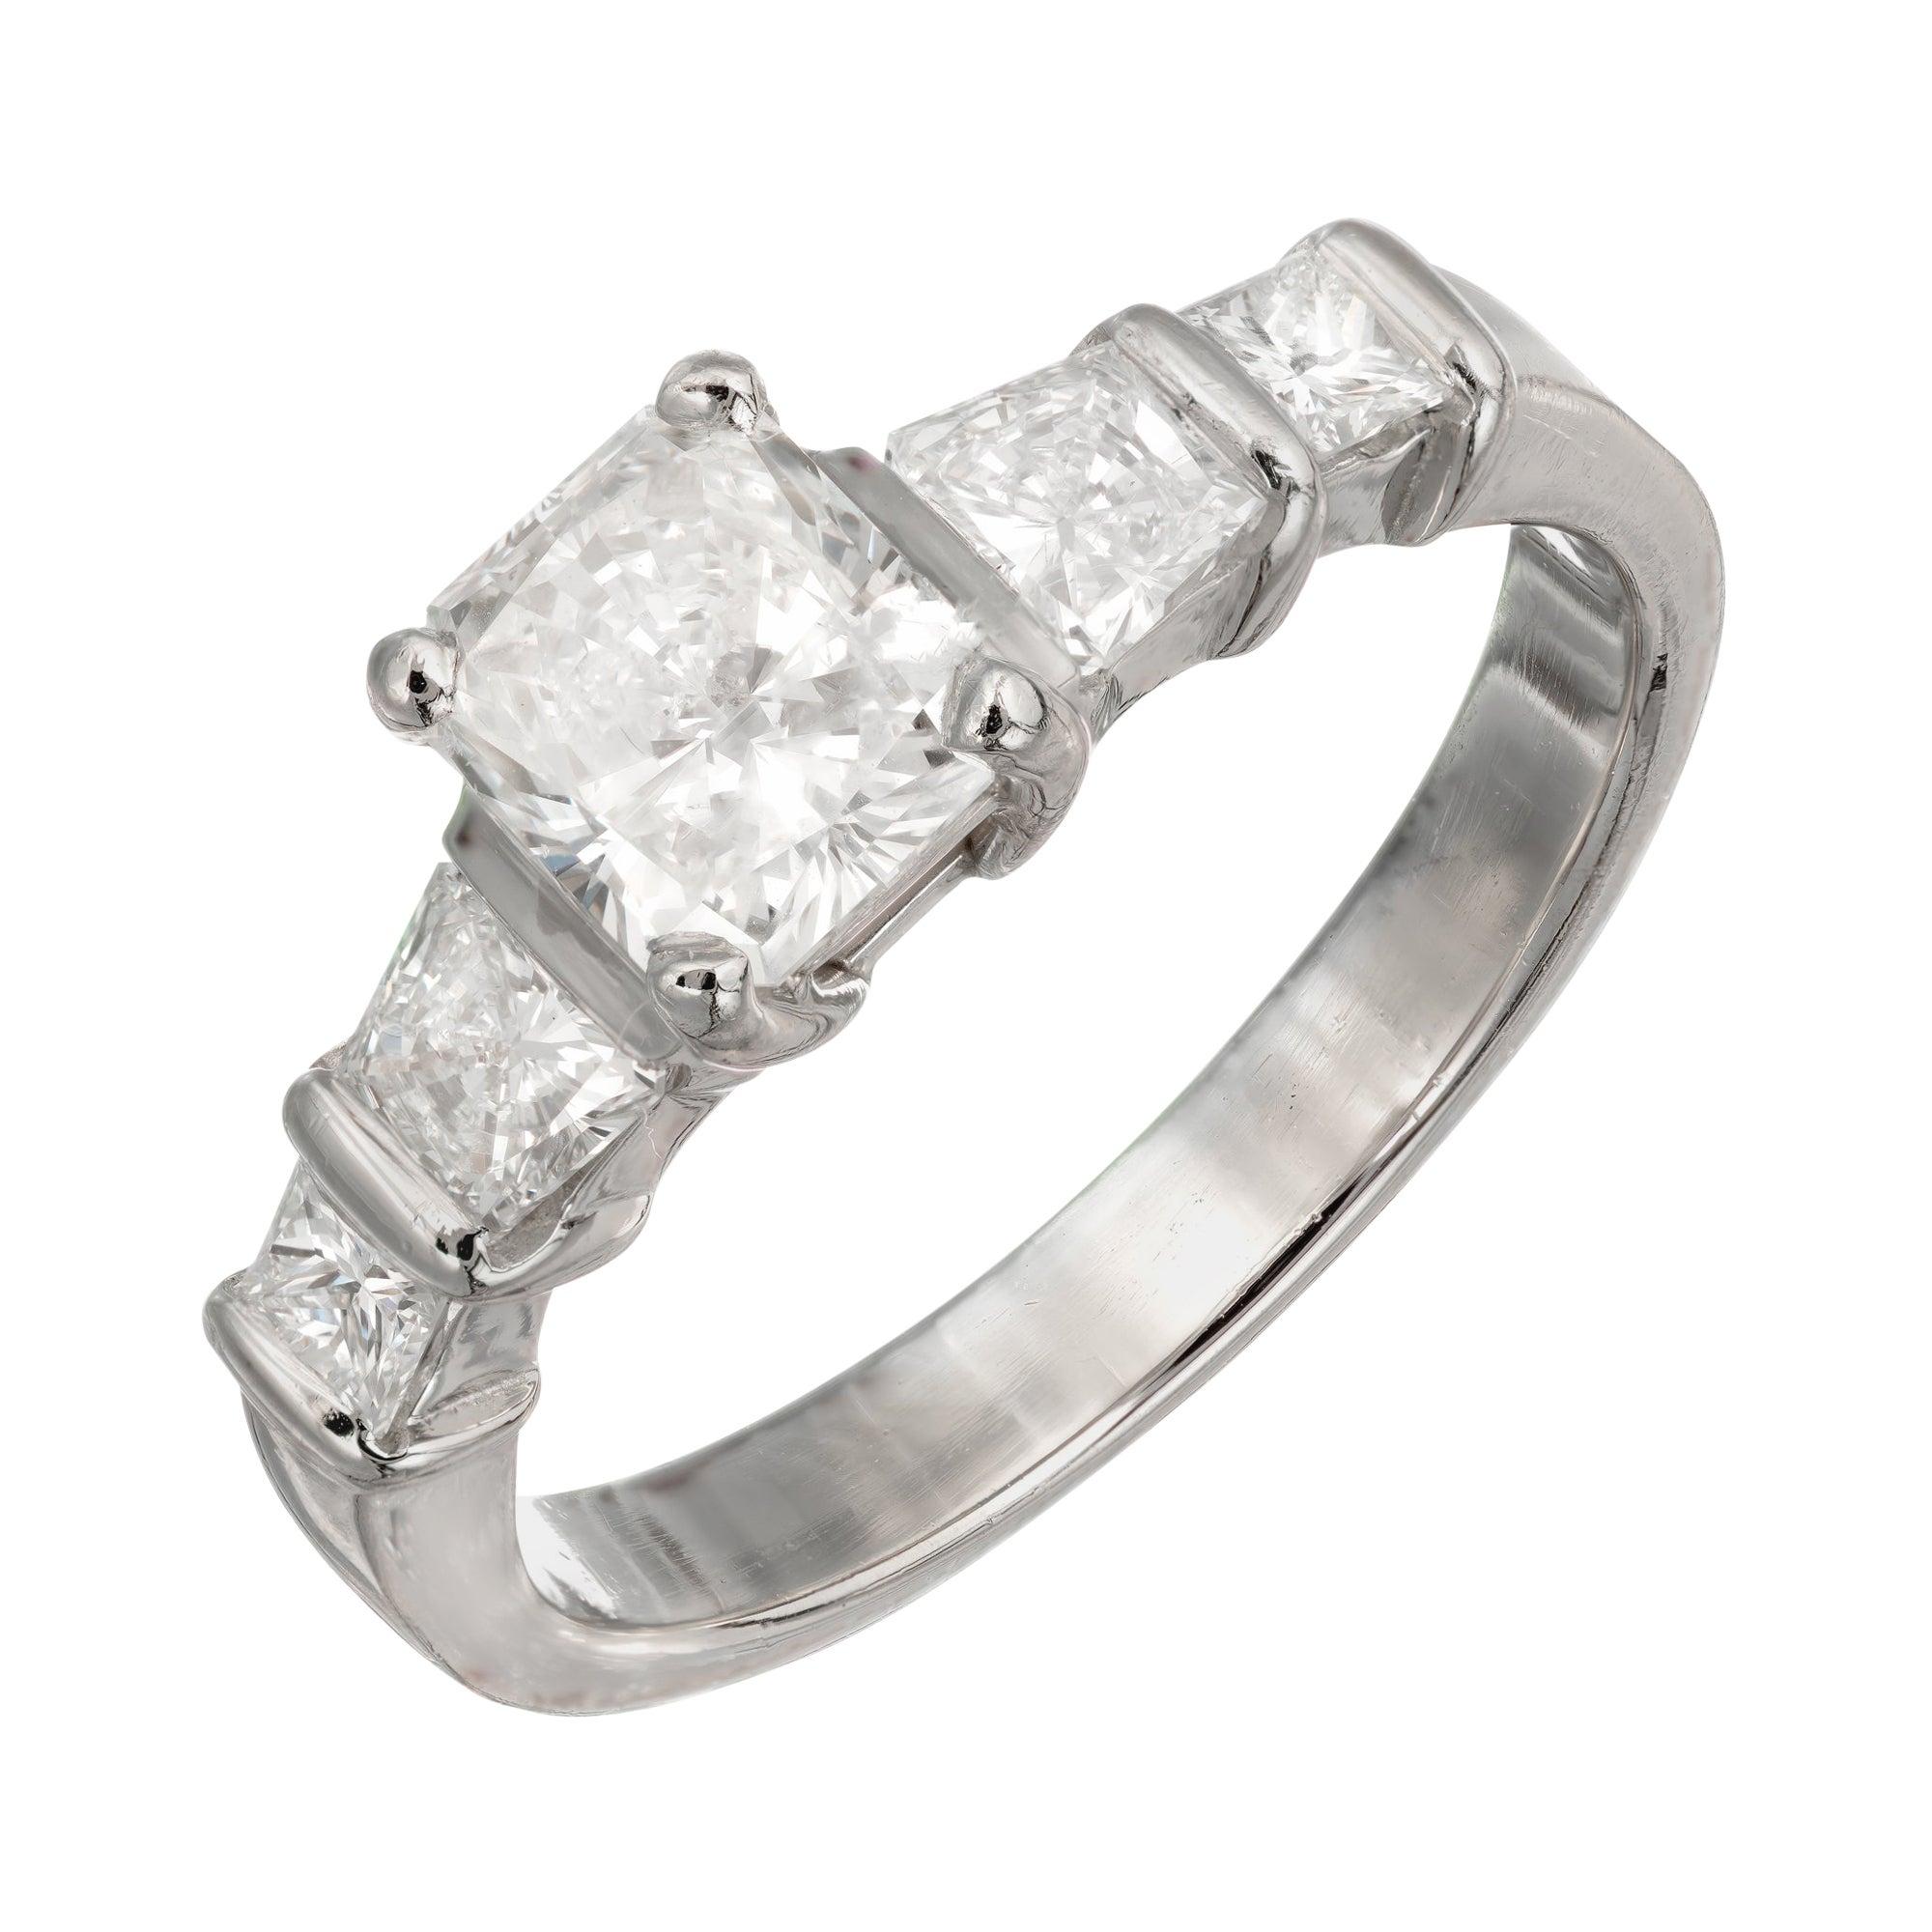 GIA Certified 1.01 Carat Radiant Cut Diamond Platinum Engagement Ring